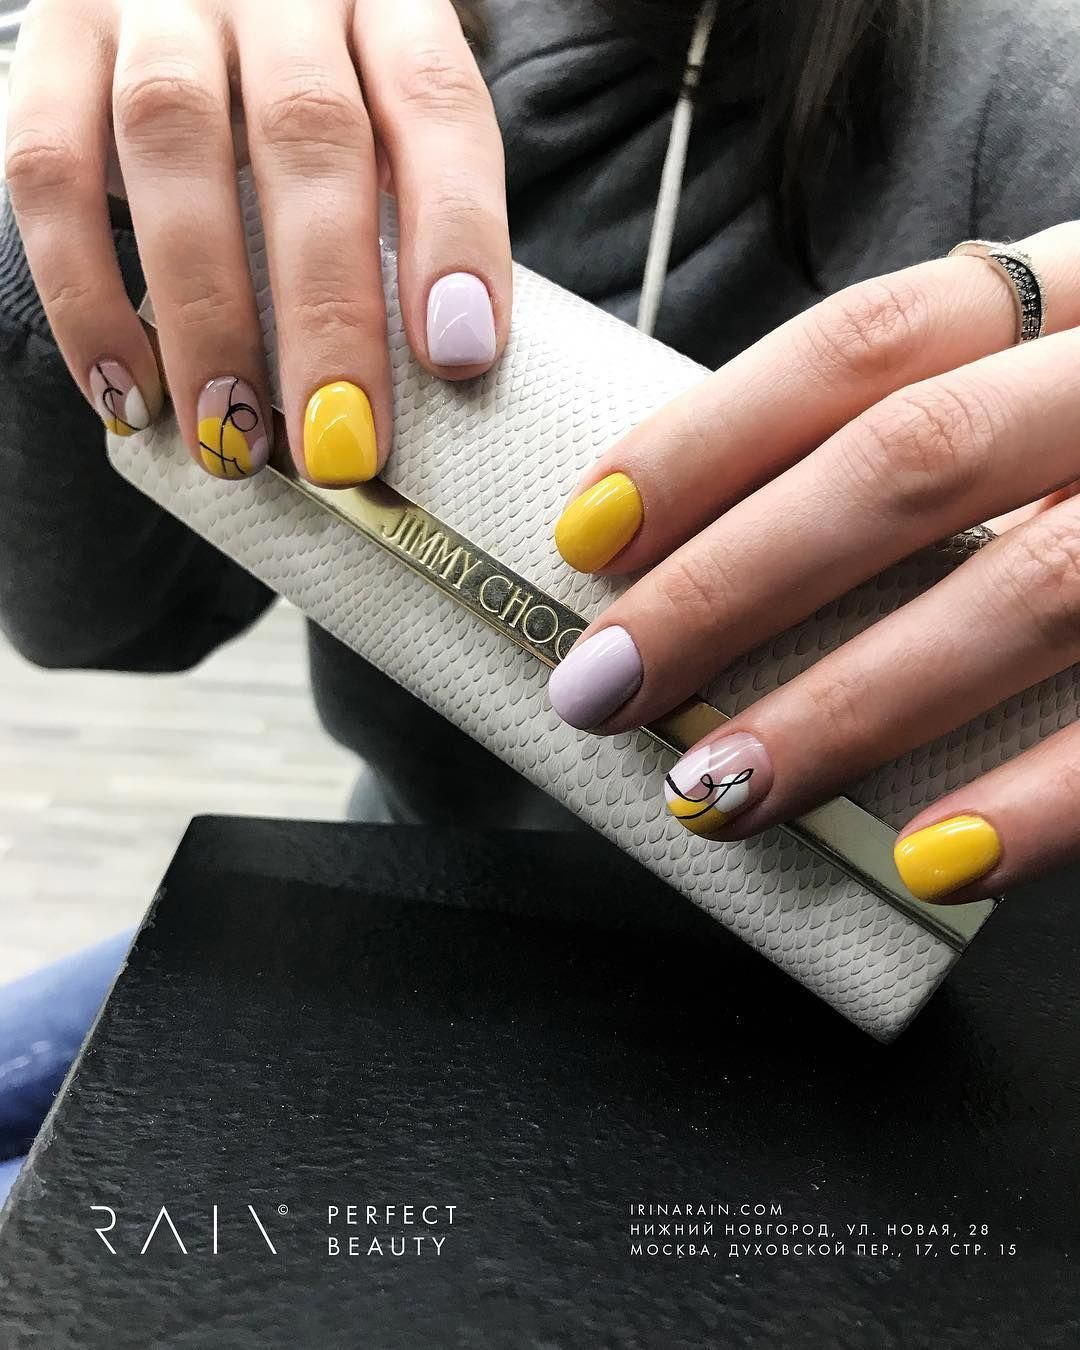 Yellow Glitter On White Glitter Nails Jurenbeauty Plain Nails Nails My Nails